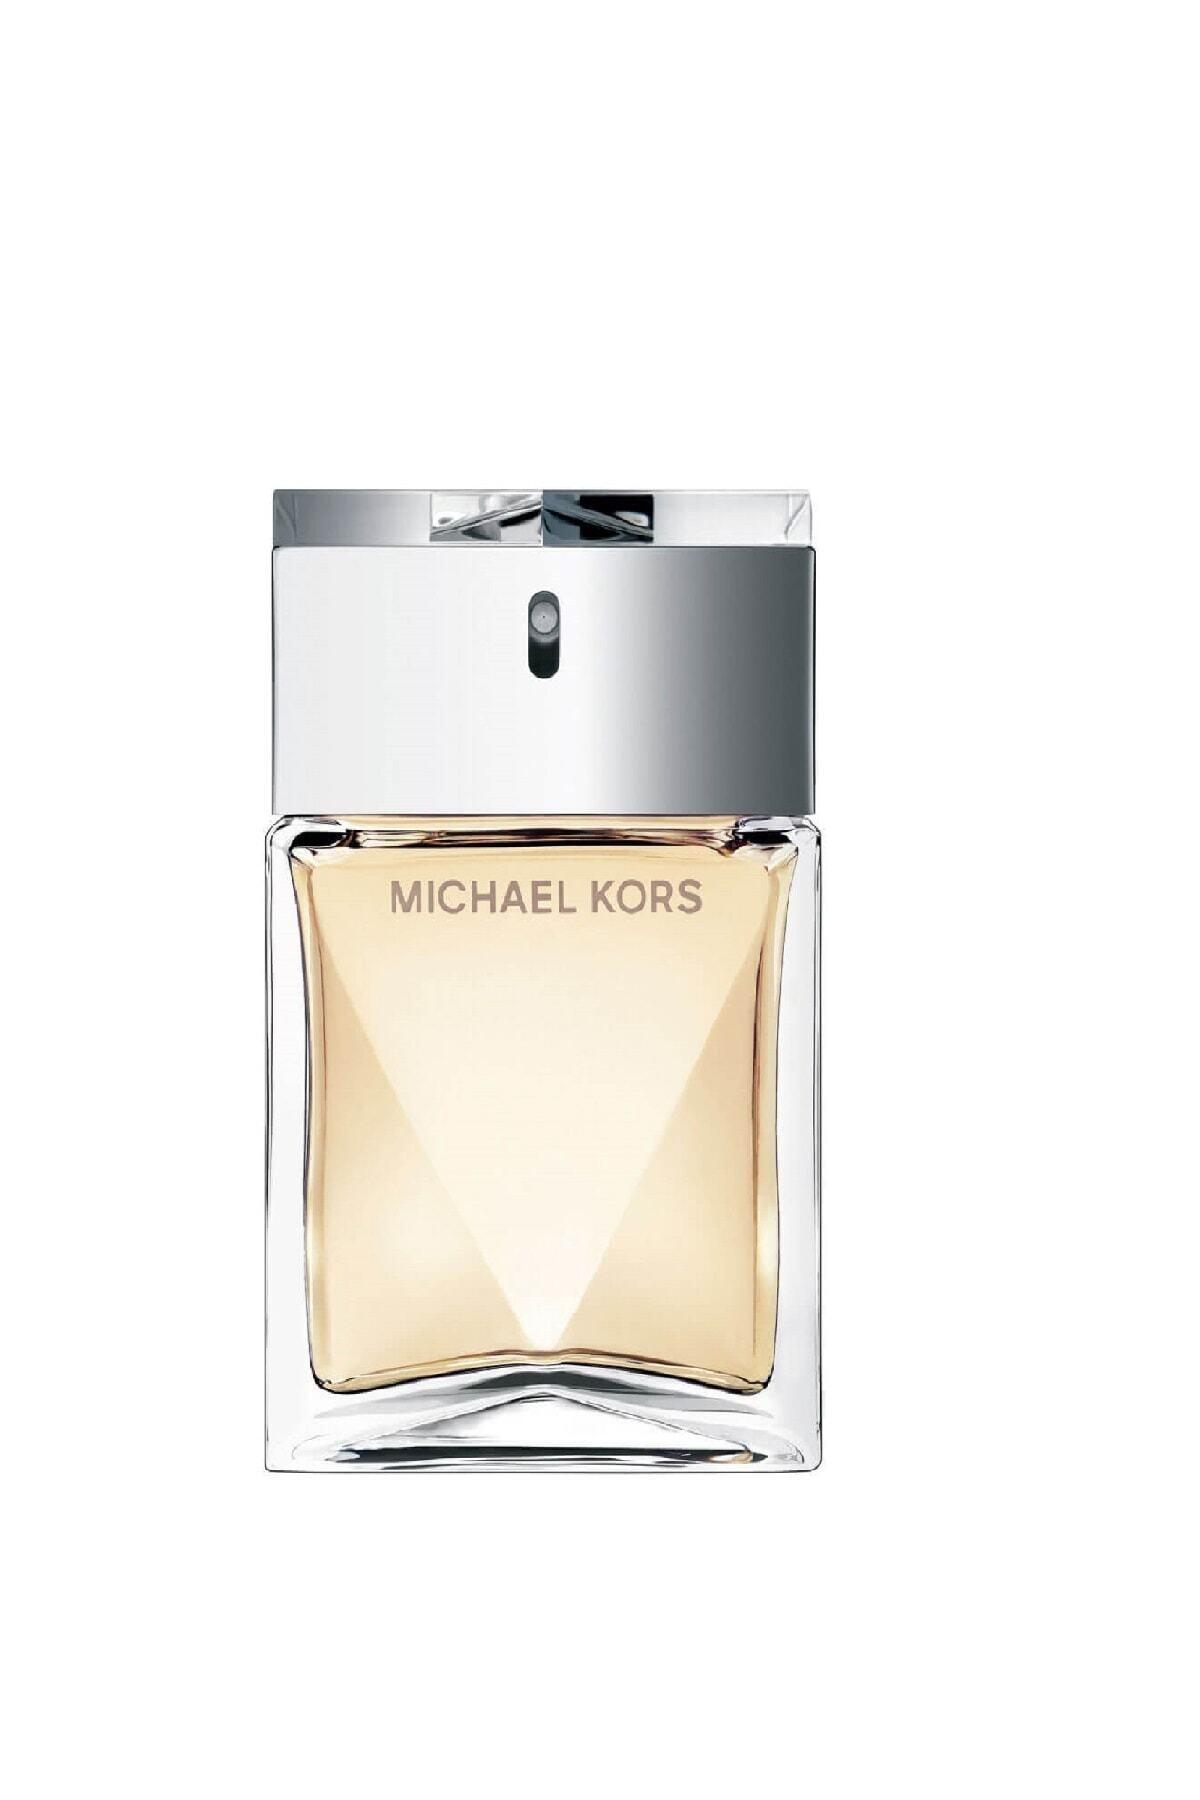 Michael Kors Woman Edp 100 ml Kadın Parfüm 22548099155 1